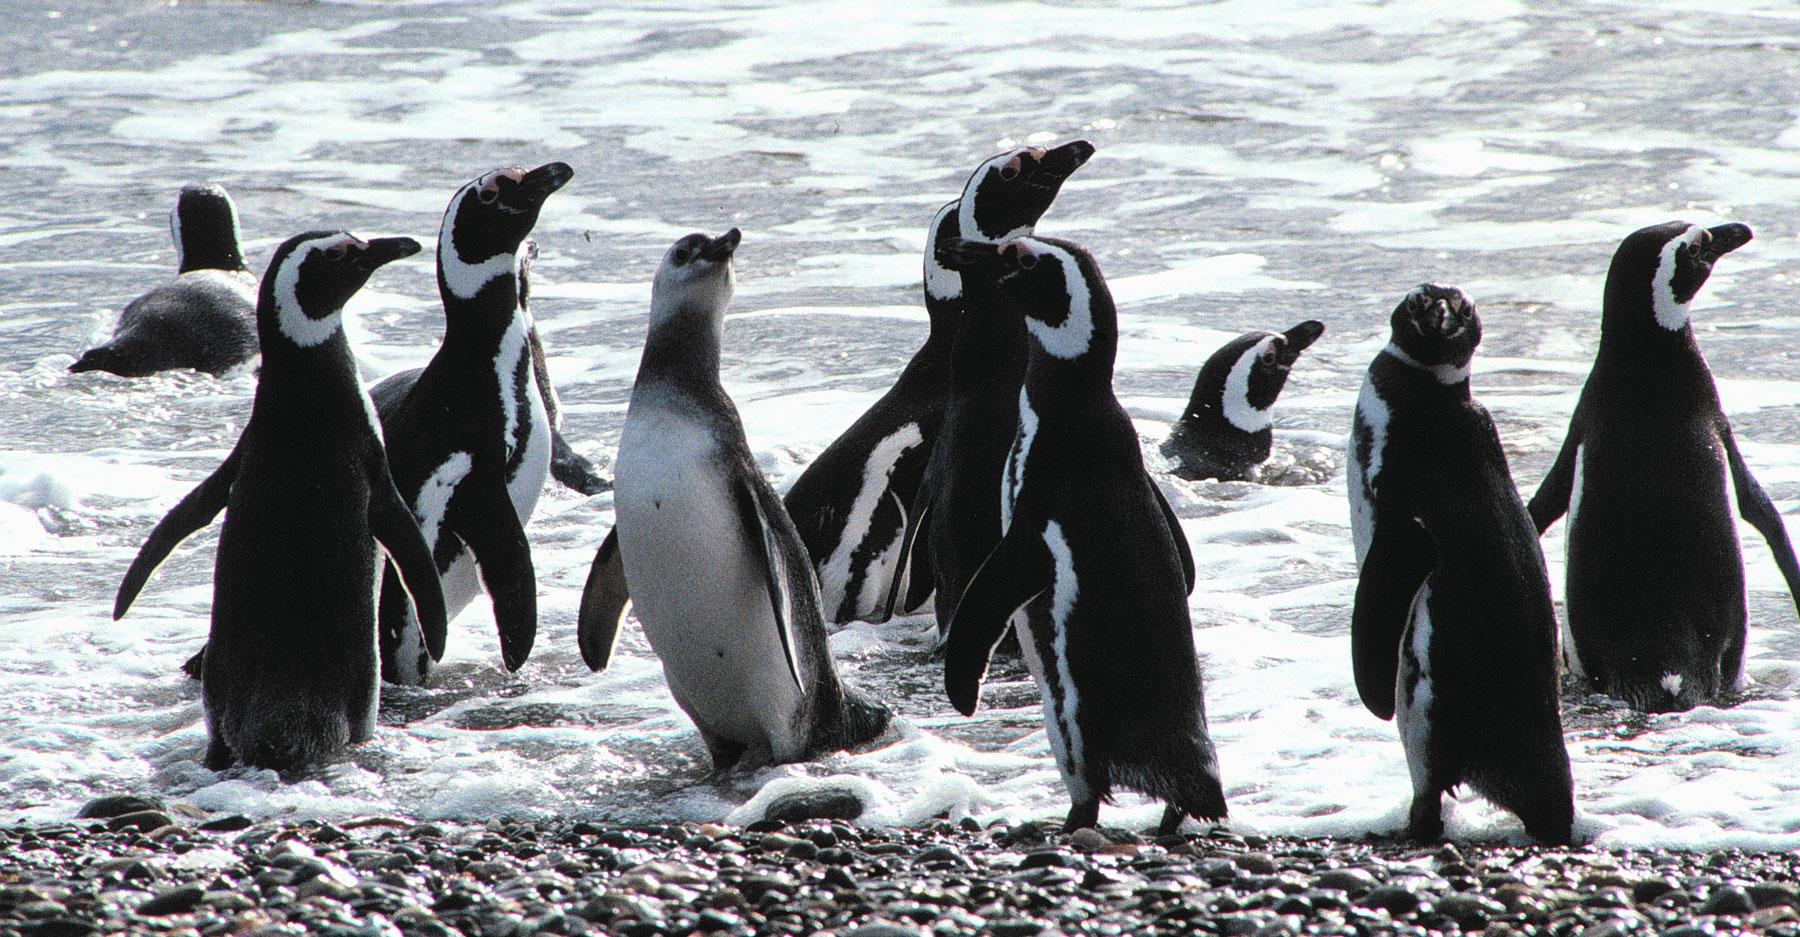 Penguins at the shoreline